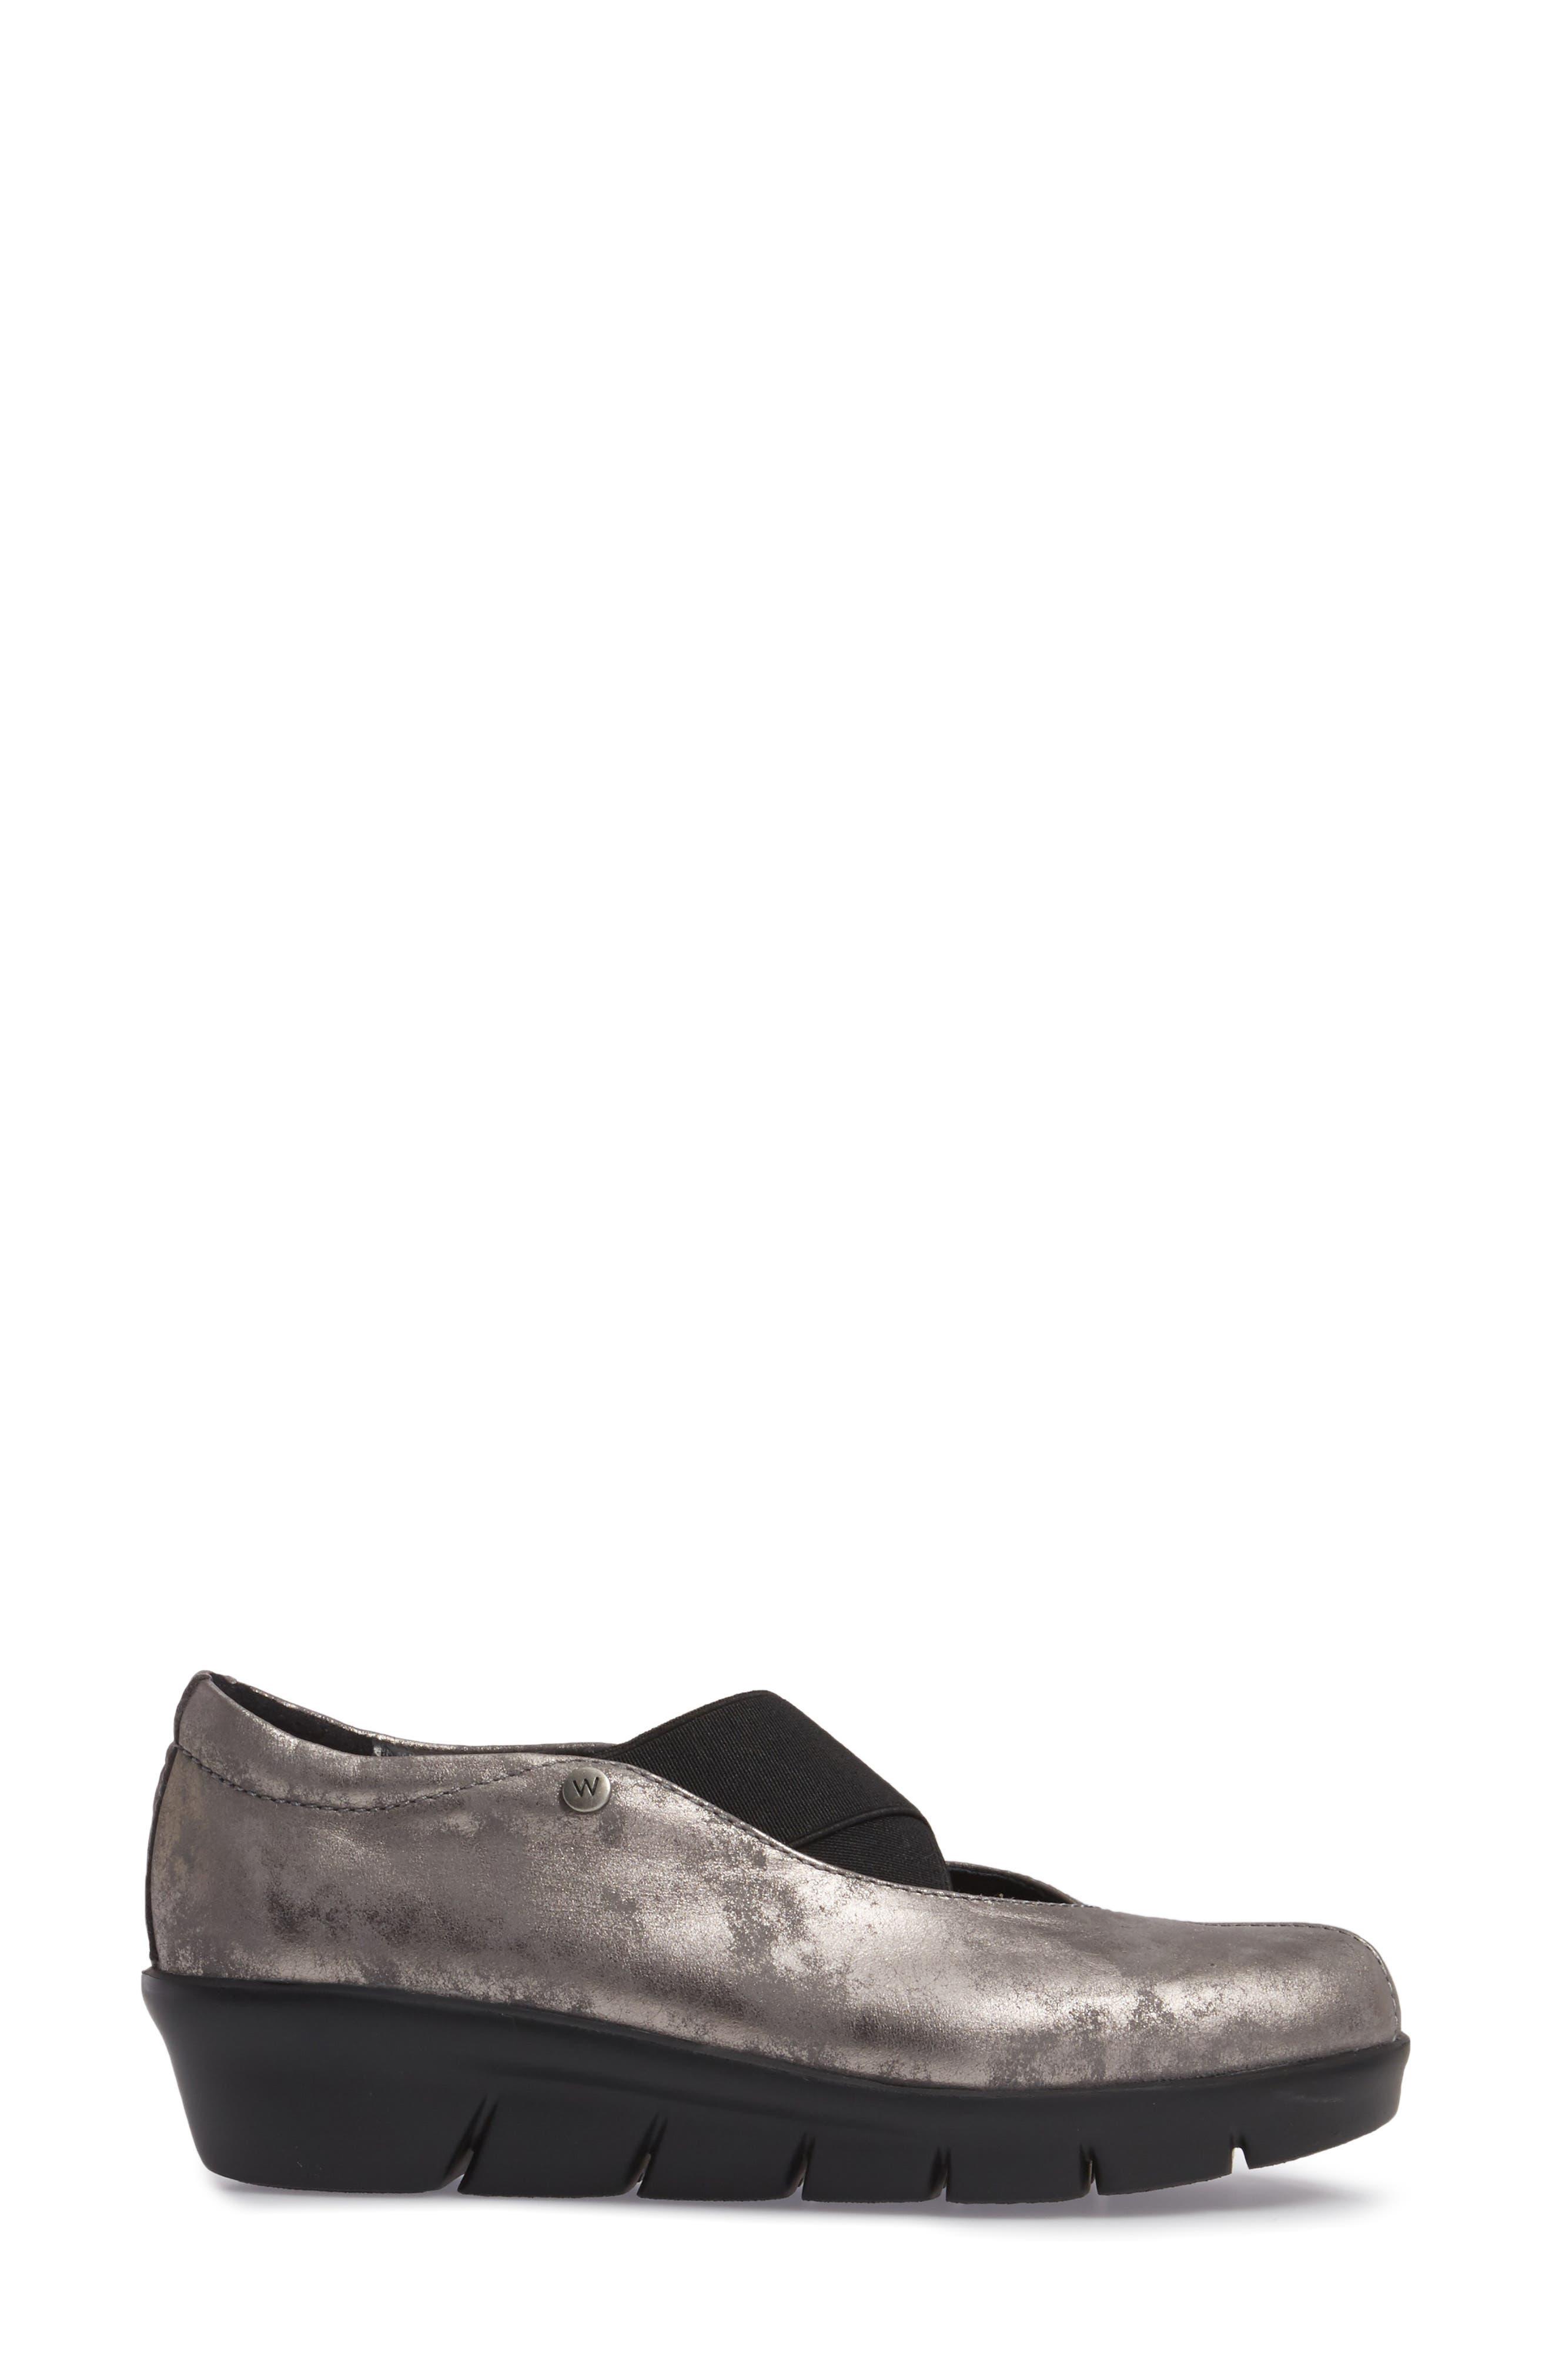 Alternate Image 3  - Wolky Cursa Slip-On Sneaker (Women)